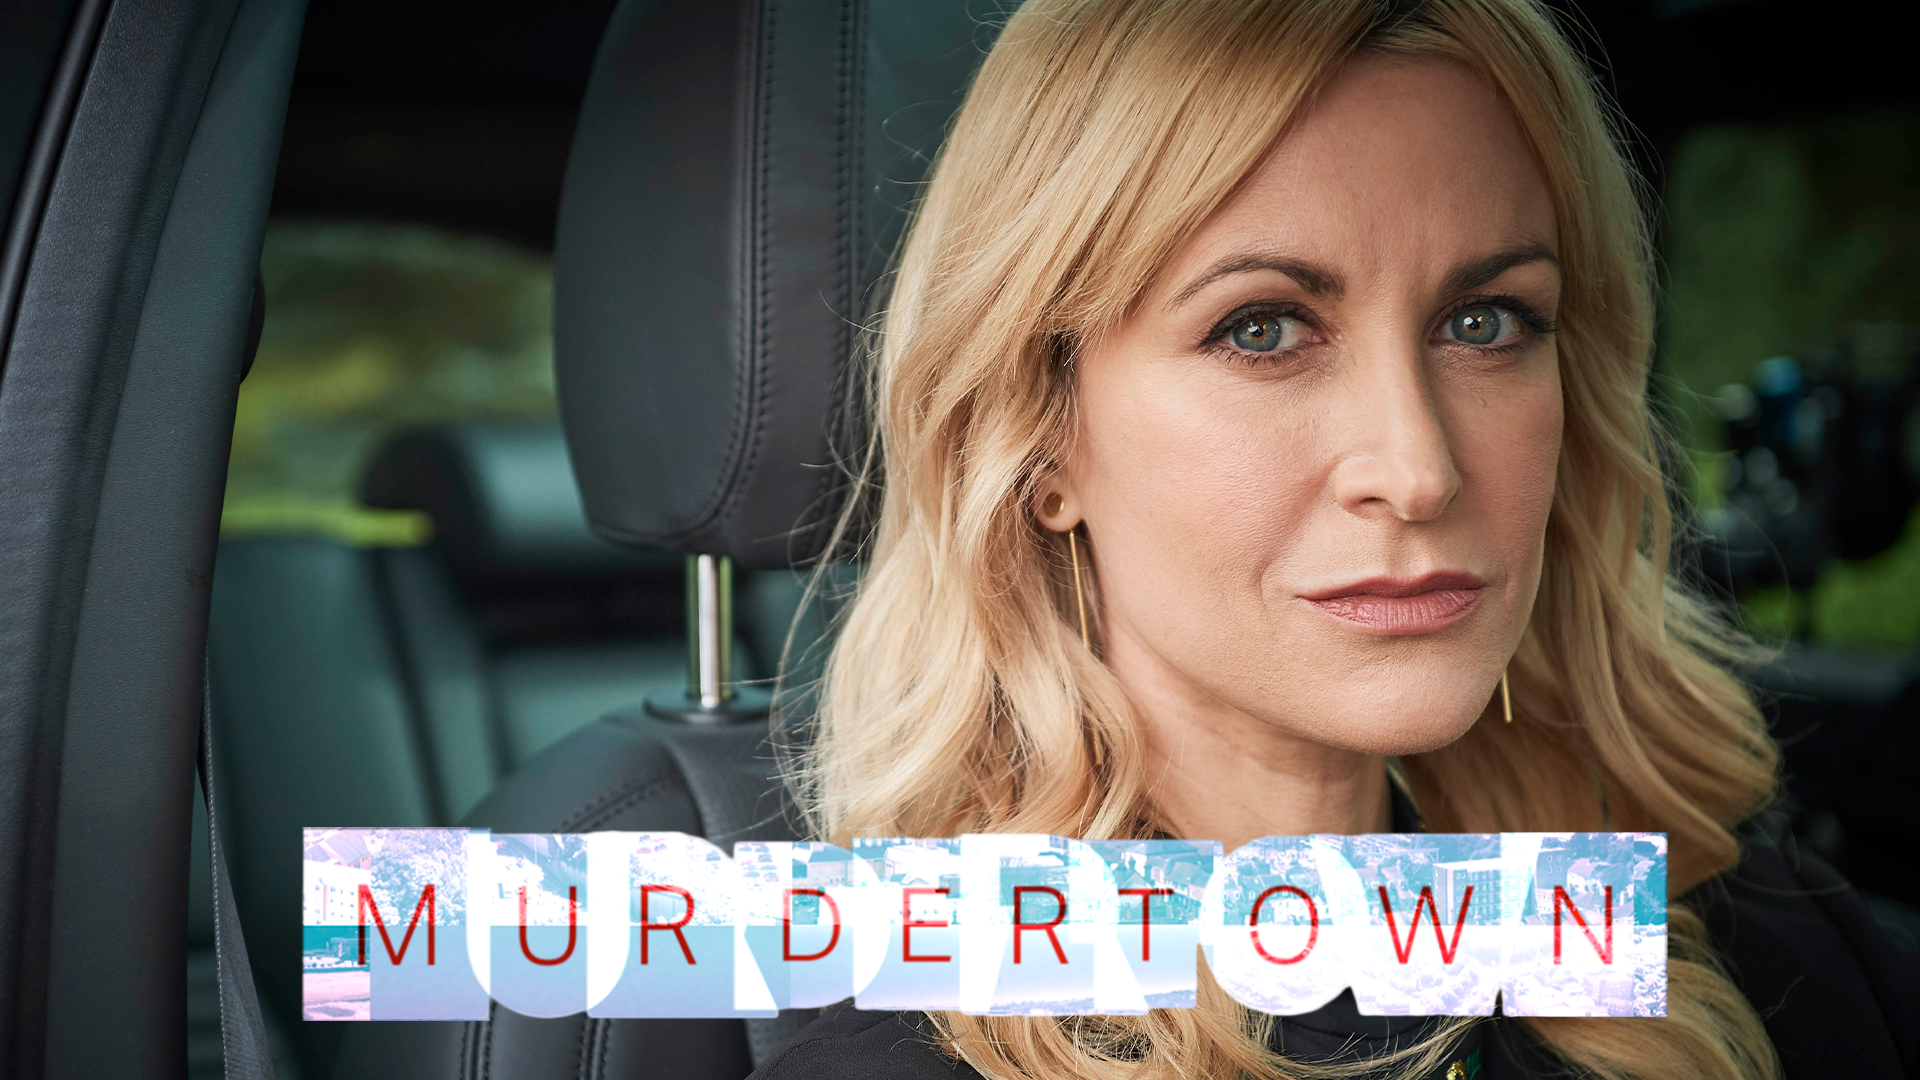 Murdertown